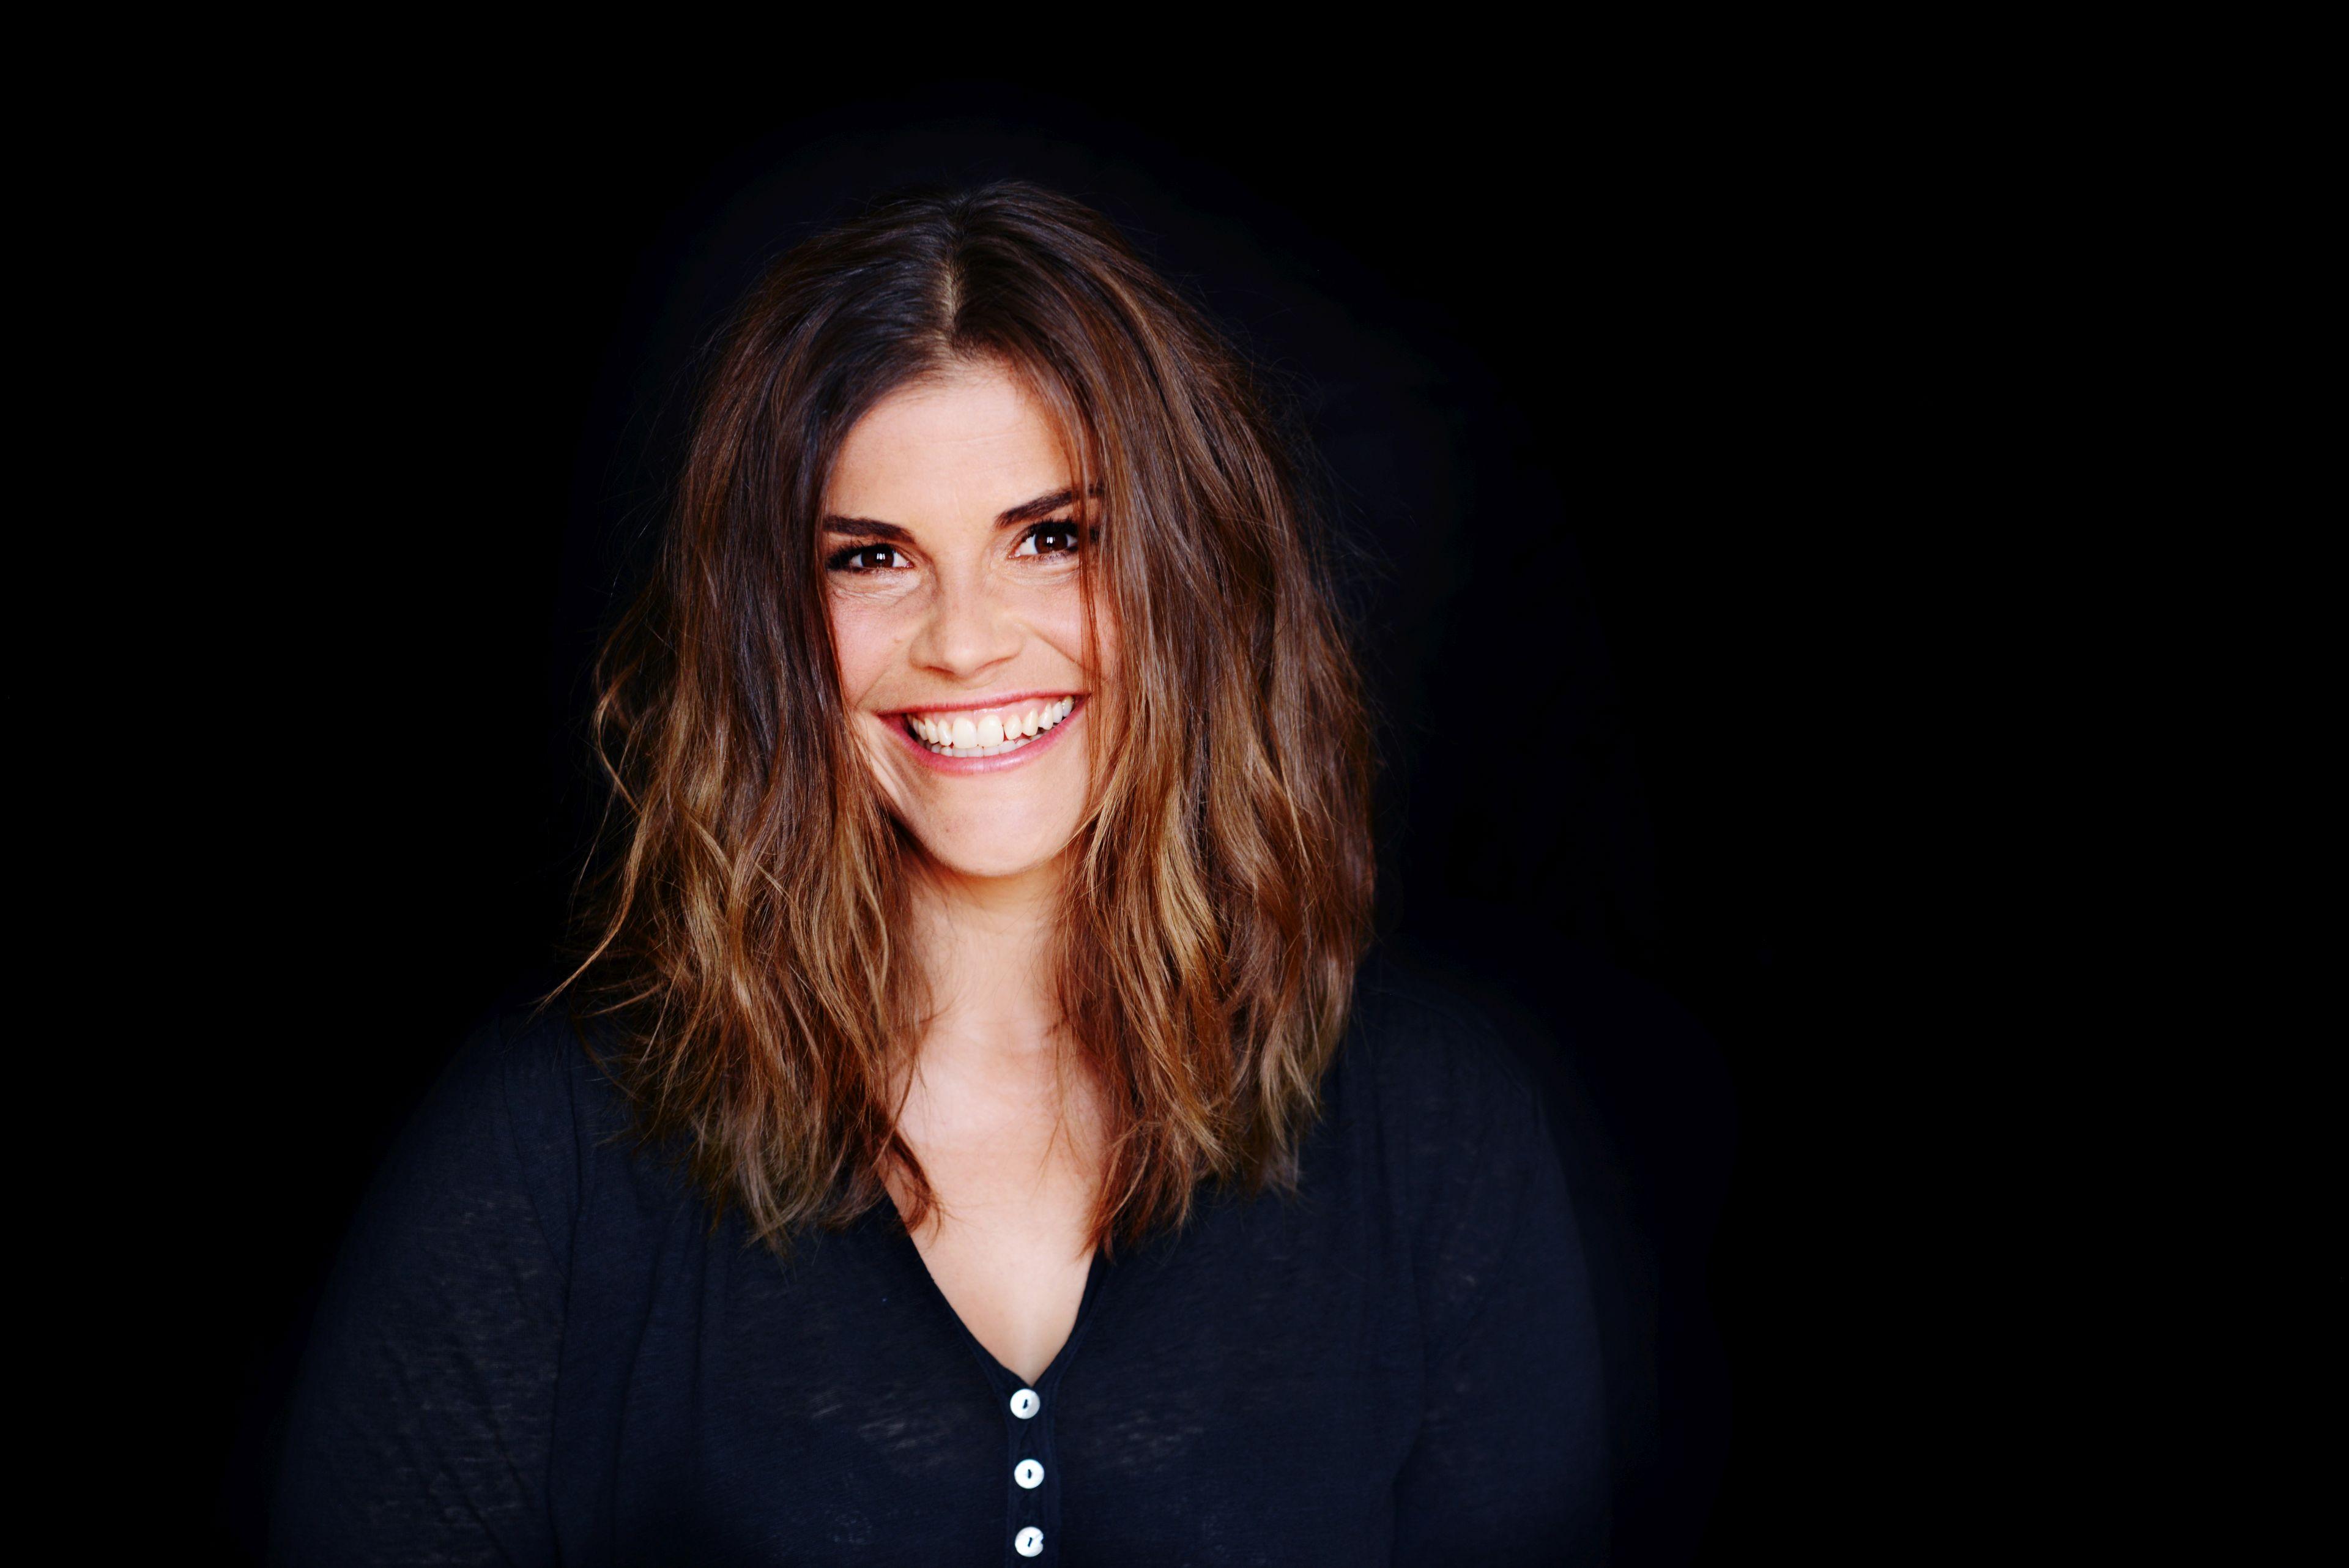 Christina Wackernagel